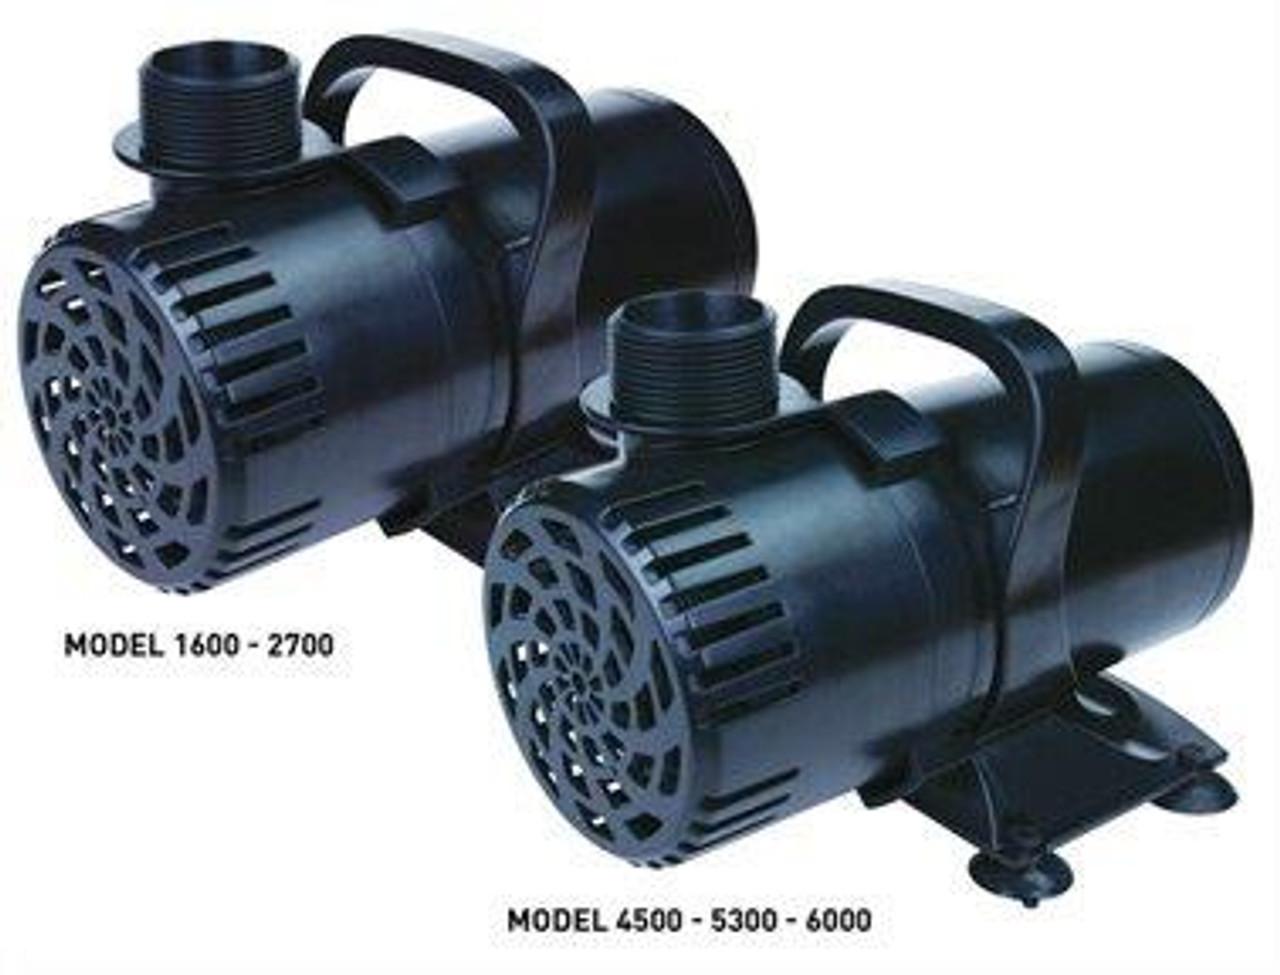 Lifegard PG Pump Model 4500 /R800002